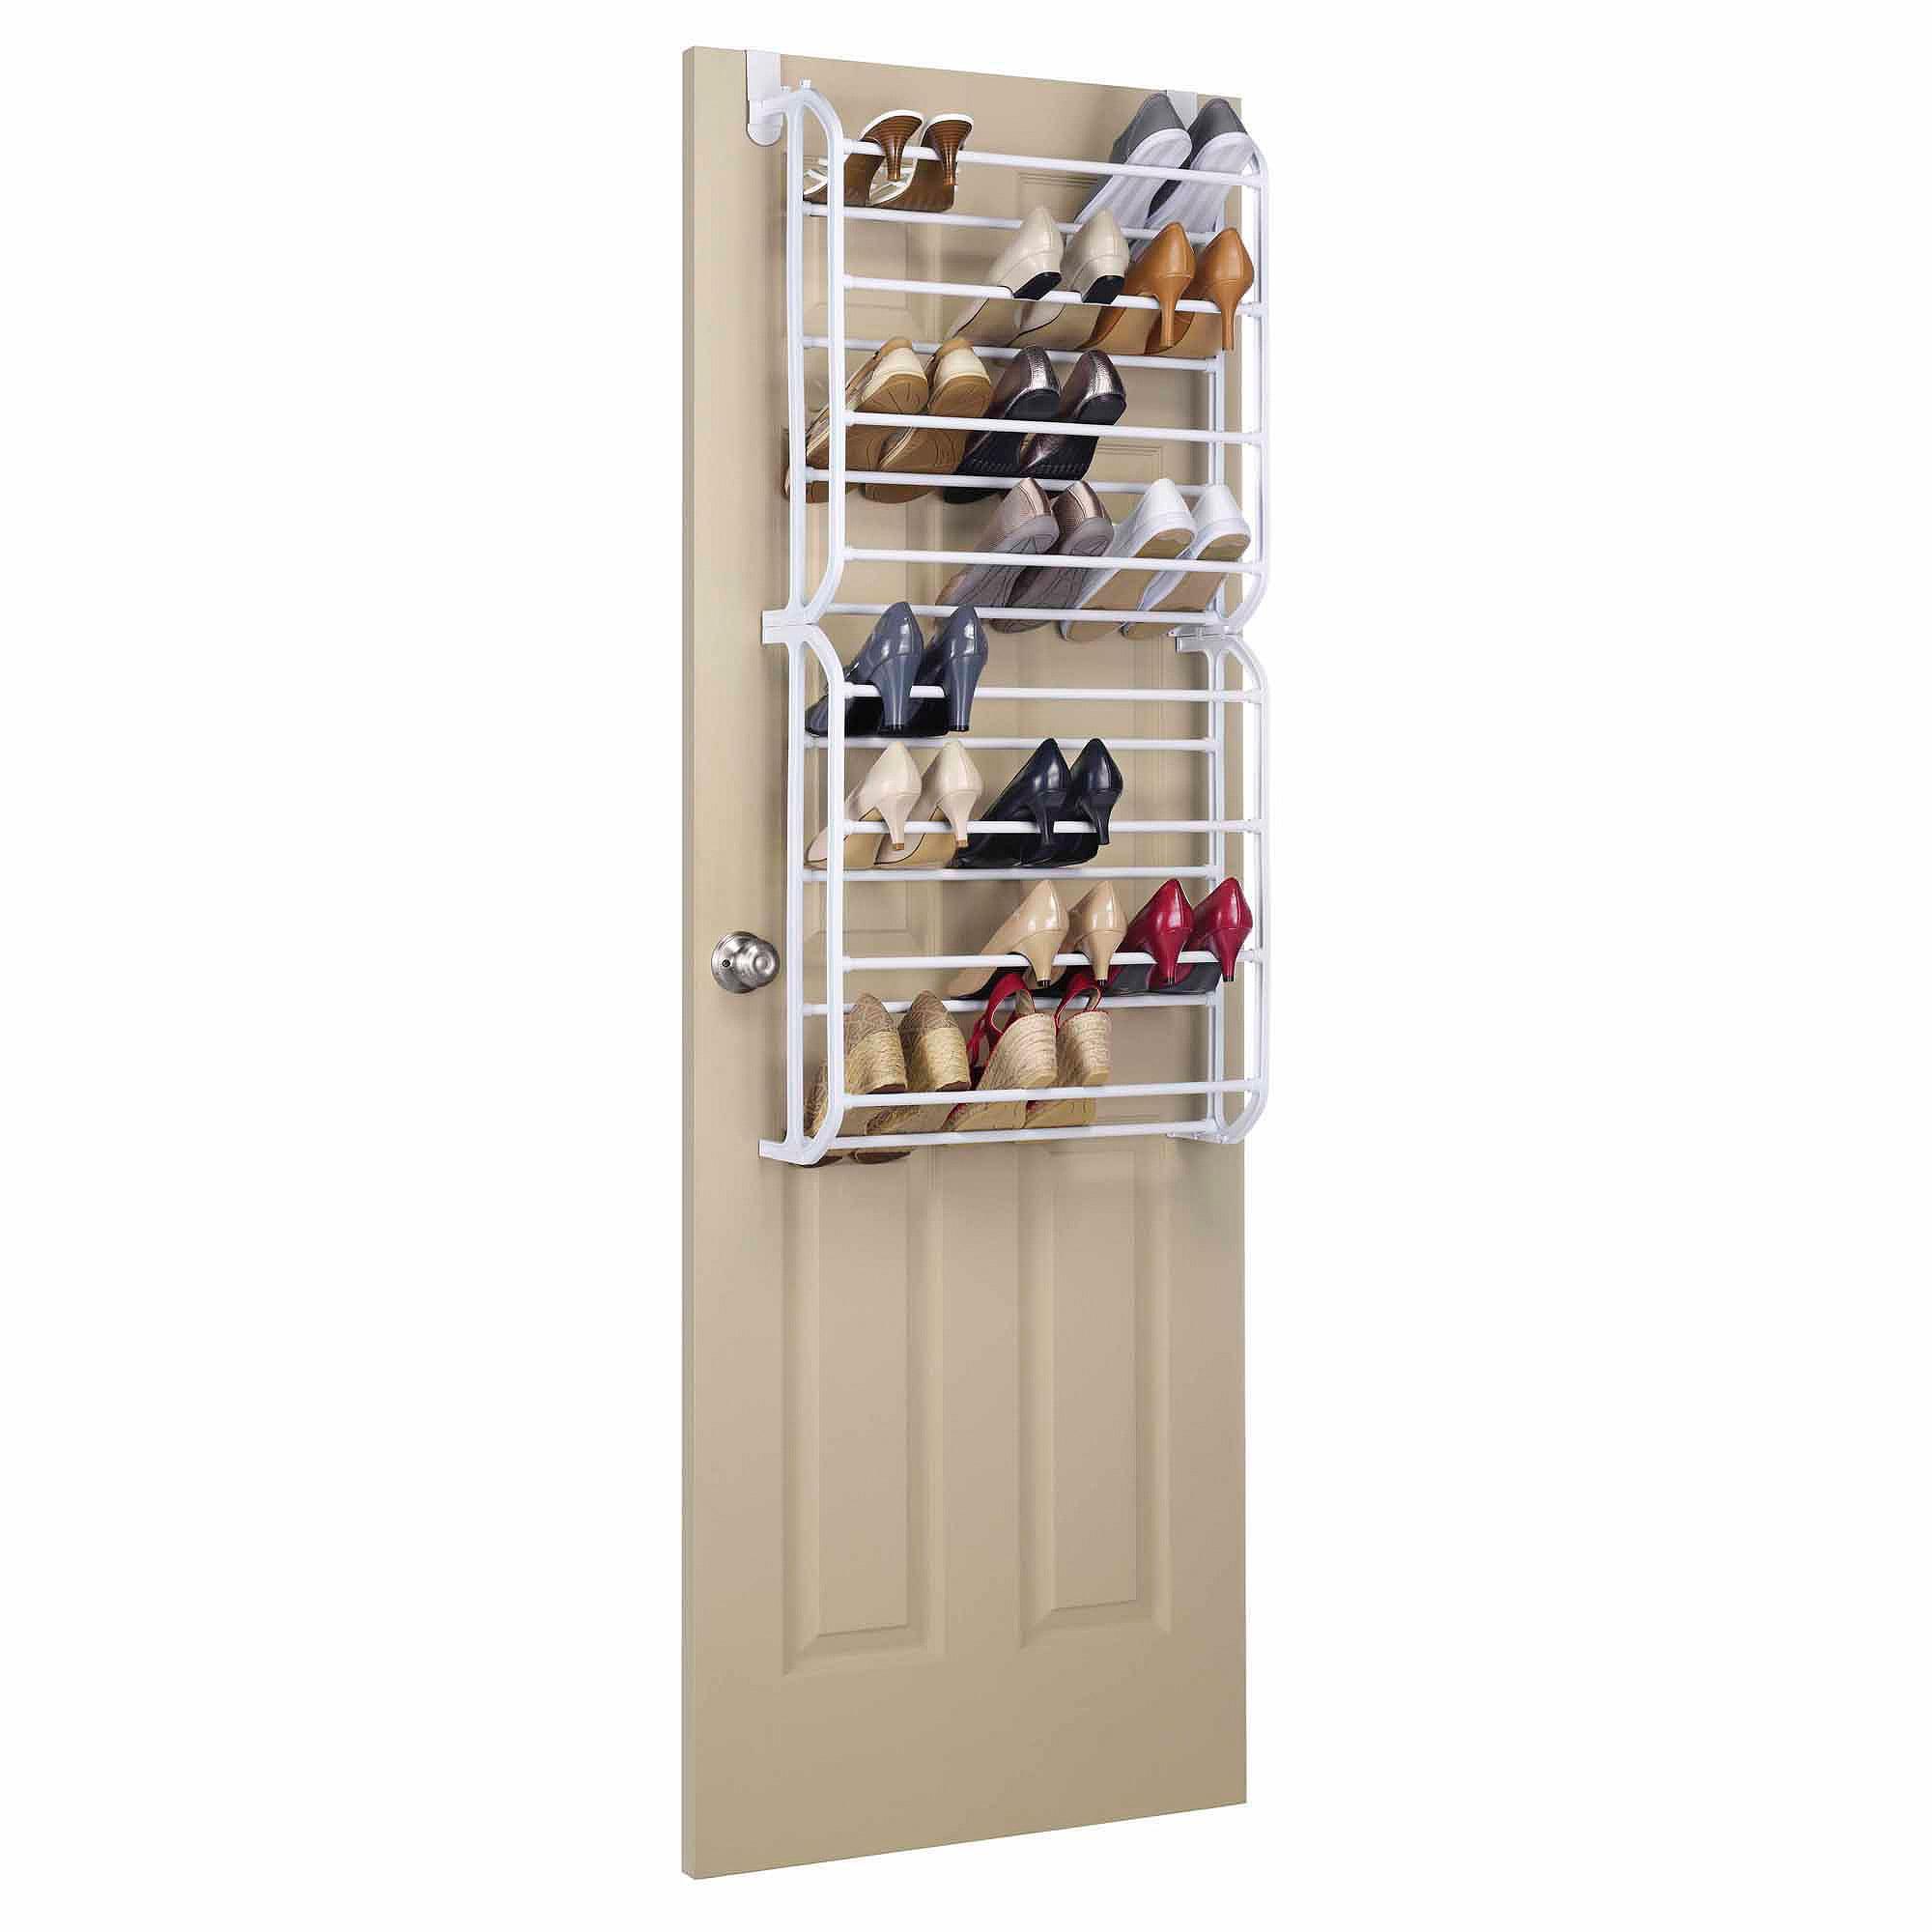 Whitmor 24-Pair Over-the-Door Shoe Rack by Whitmor Inc